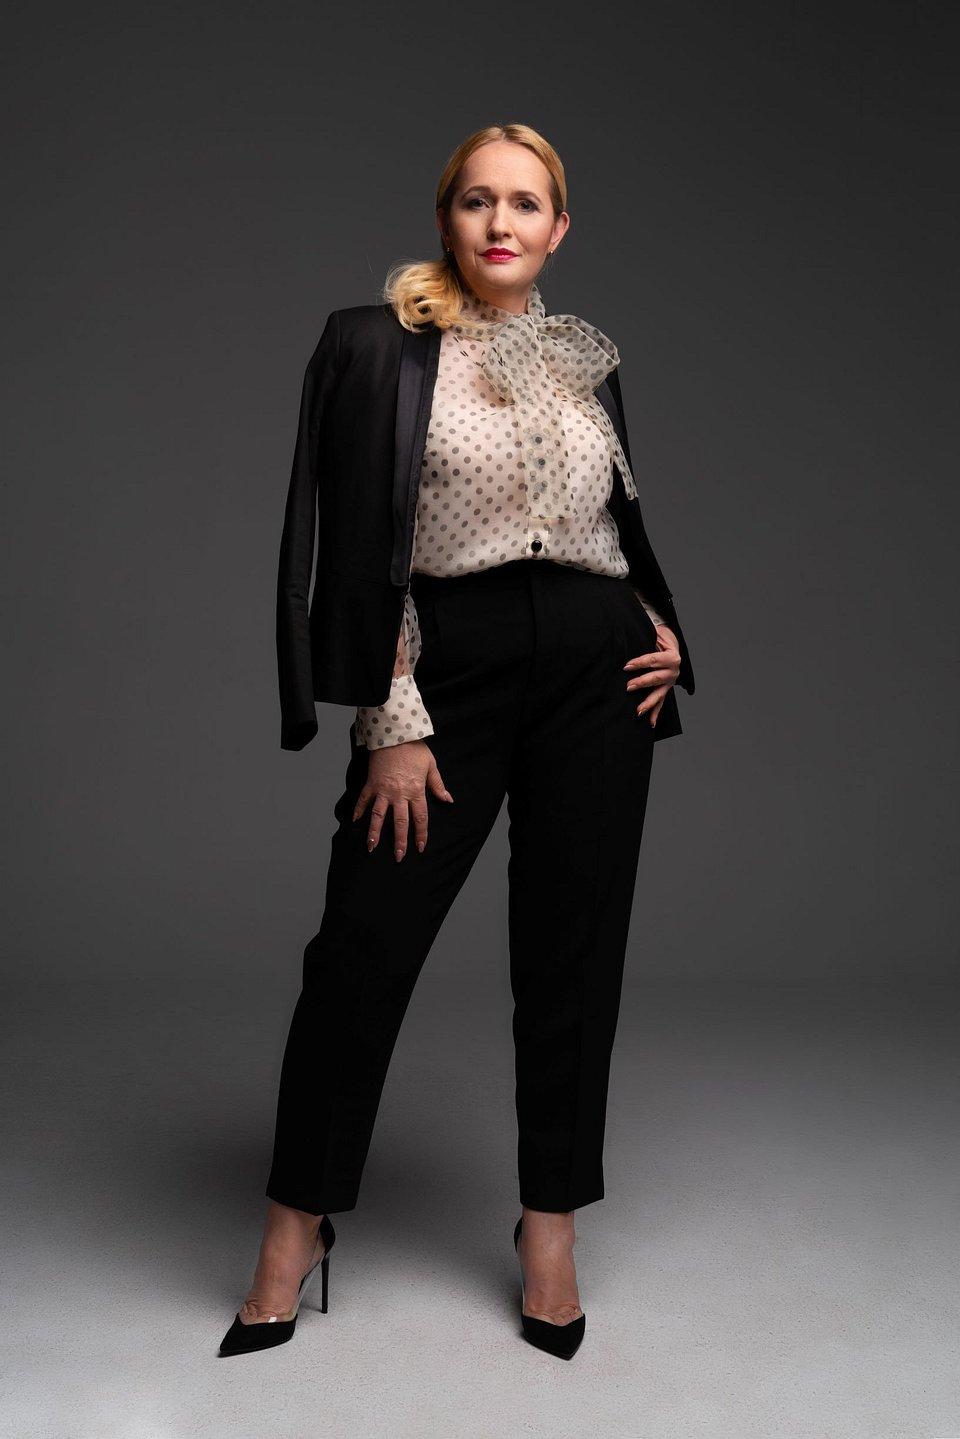 Dorota Bieniek-Kaska, prezes zarządu Love Brands Relations.